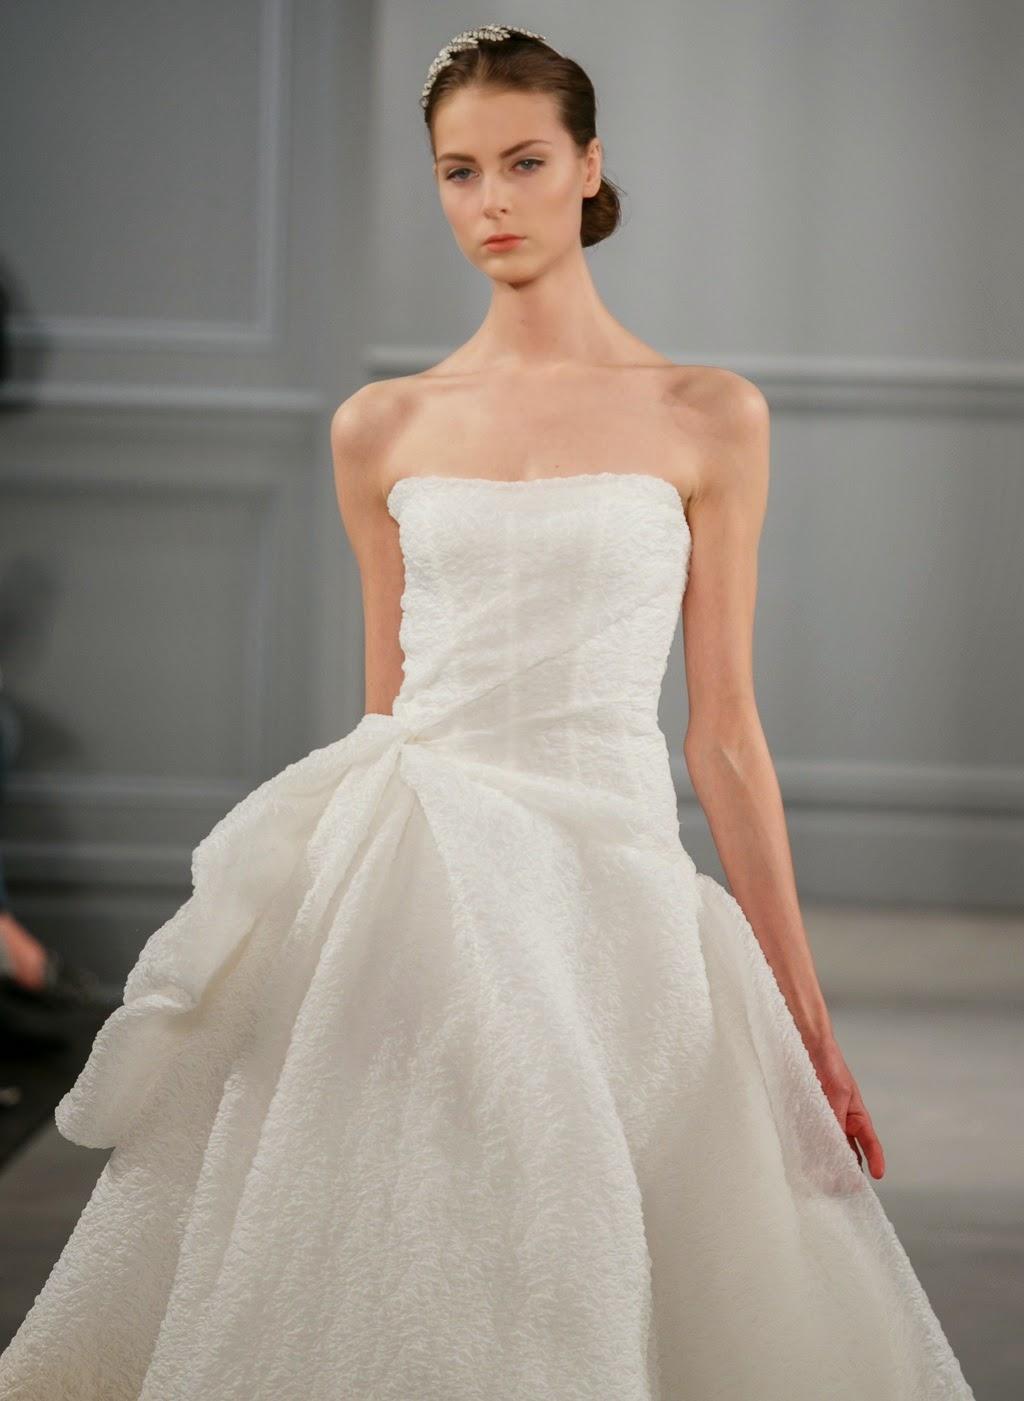 Wedding Dresses Trends 2014